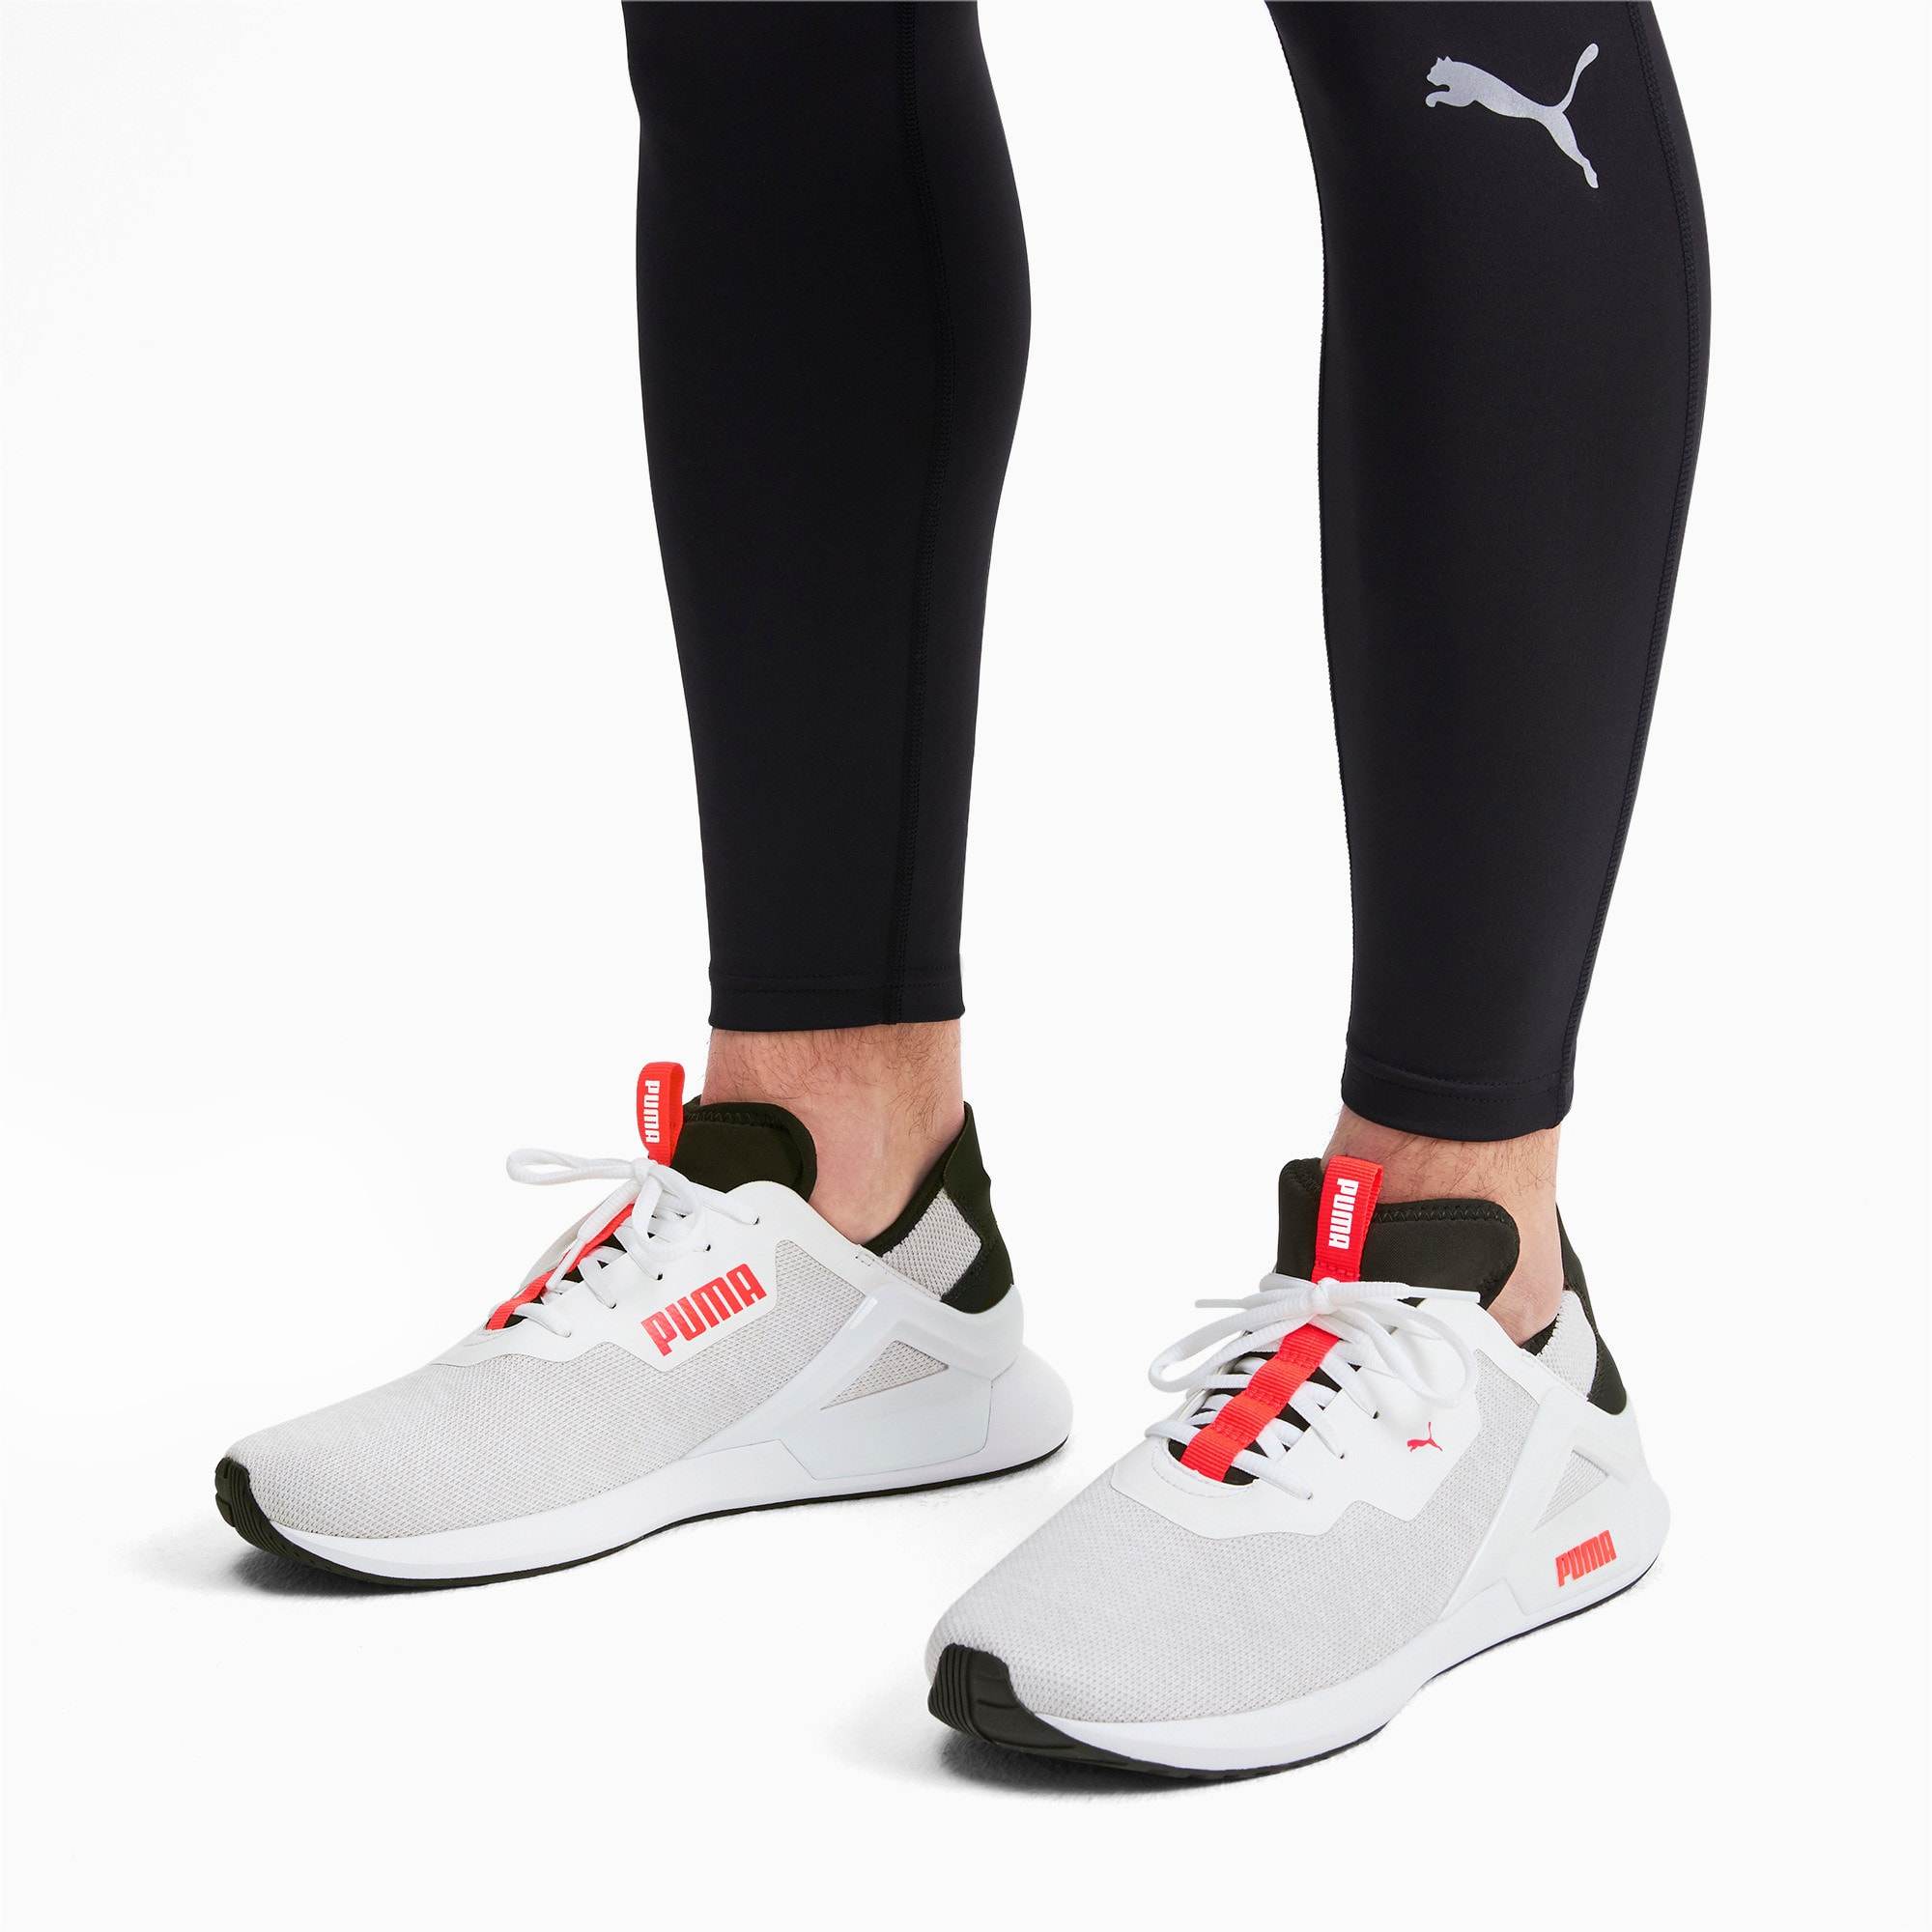 Thumbnail 2 of Rogue X Knit Herren Sneaker, White-Black-Nrgy Red, medium